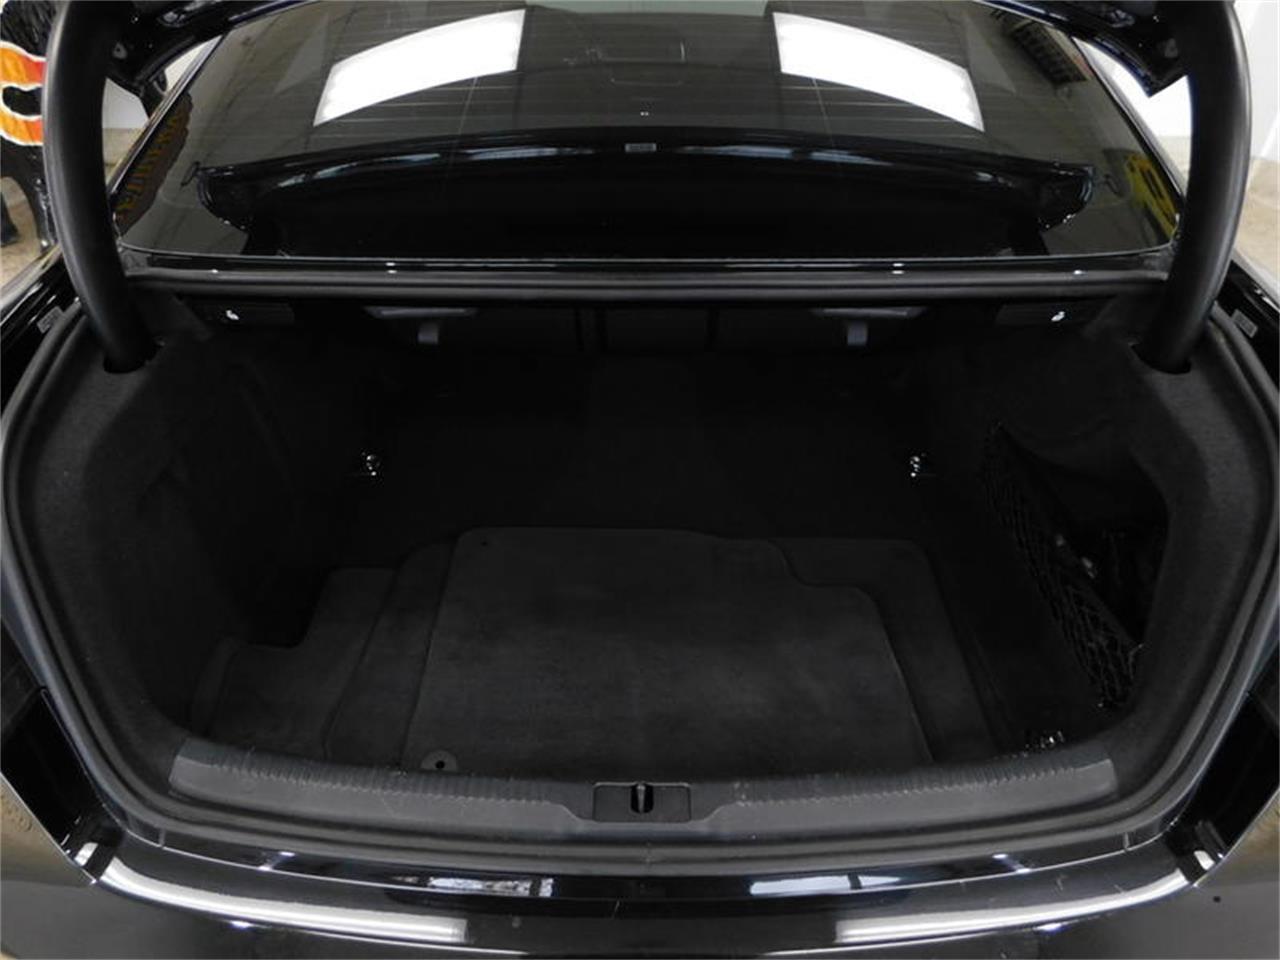 2016 Audi S5 (CC-1296701) for sale in Hamburg, New York